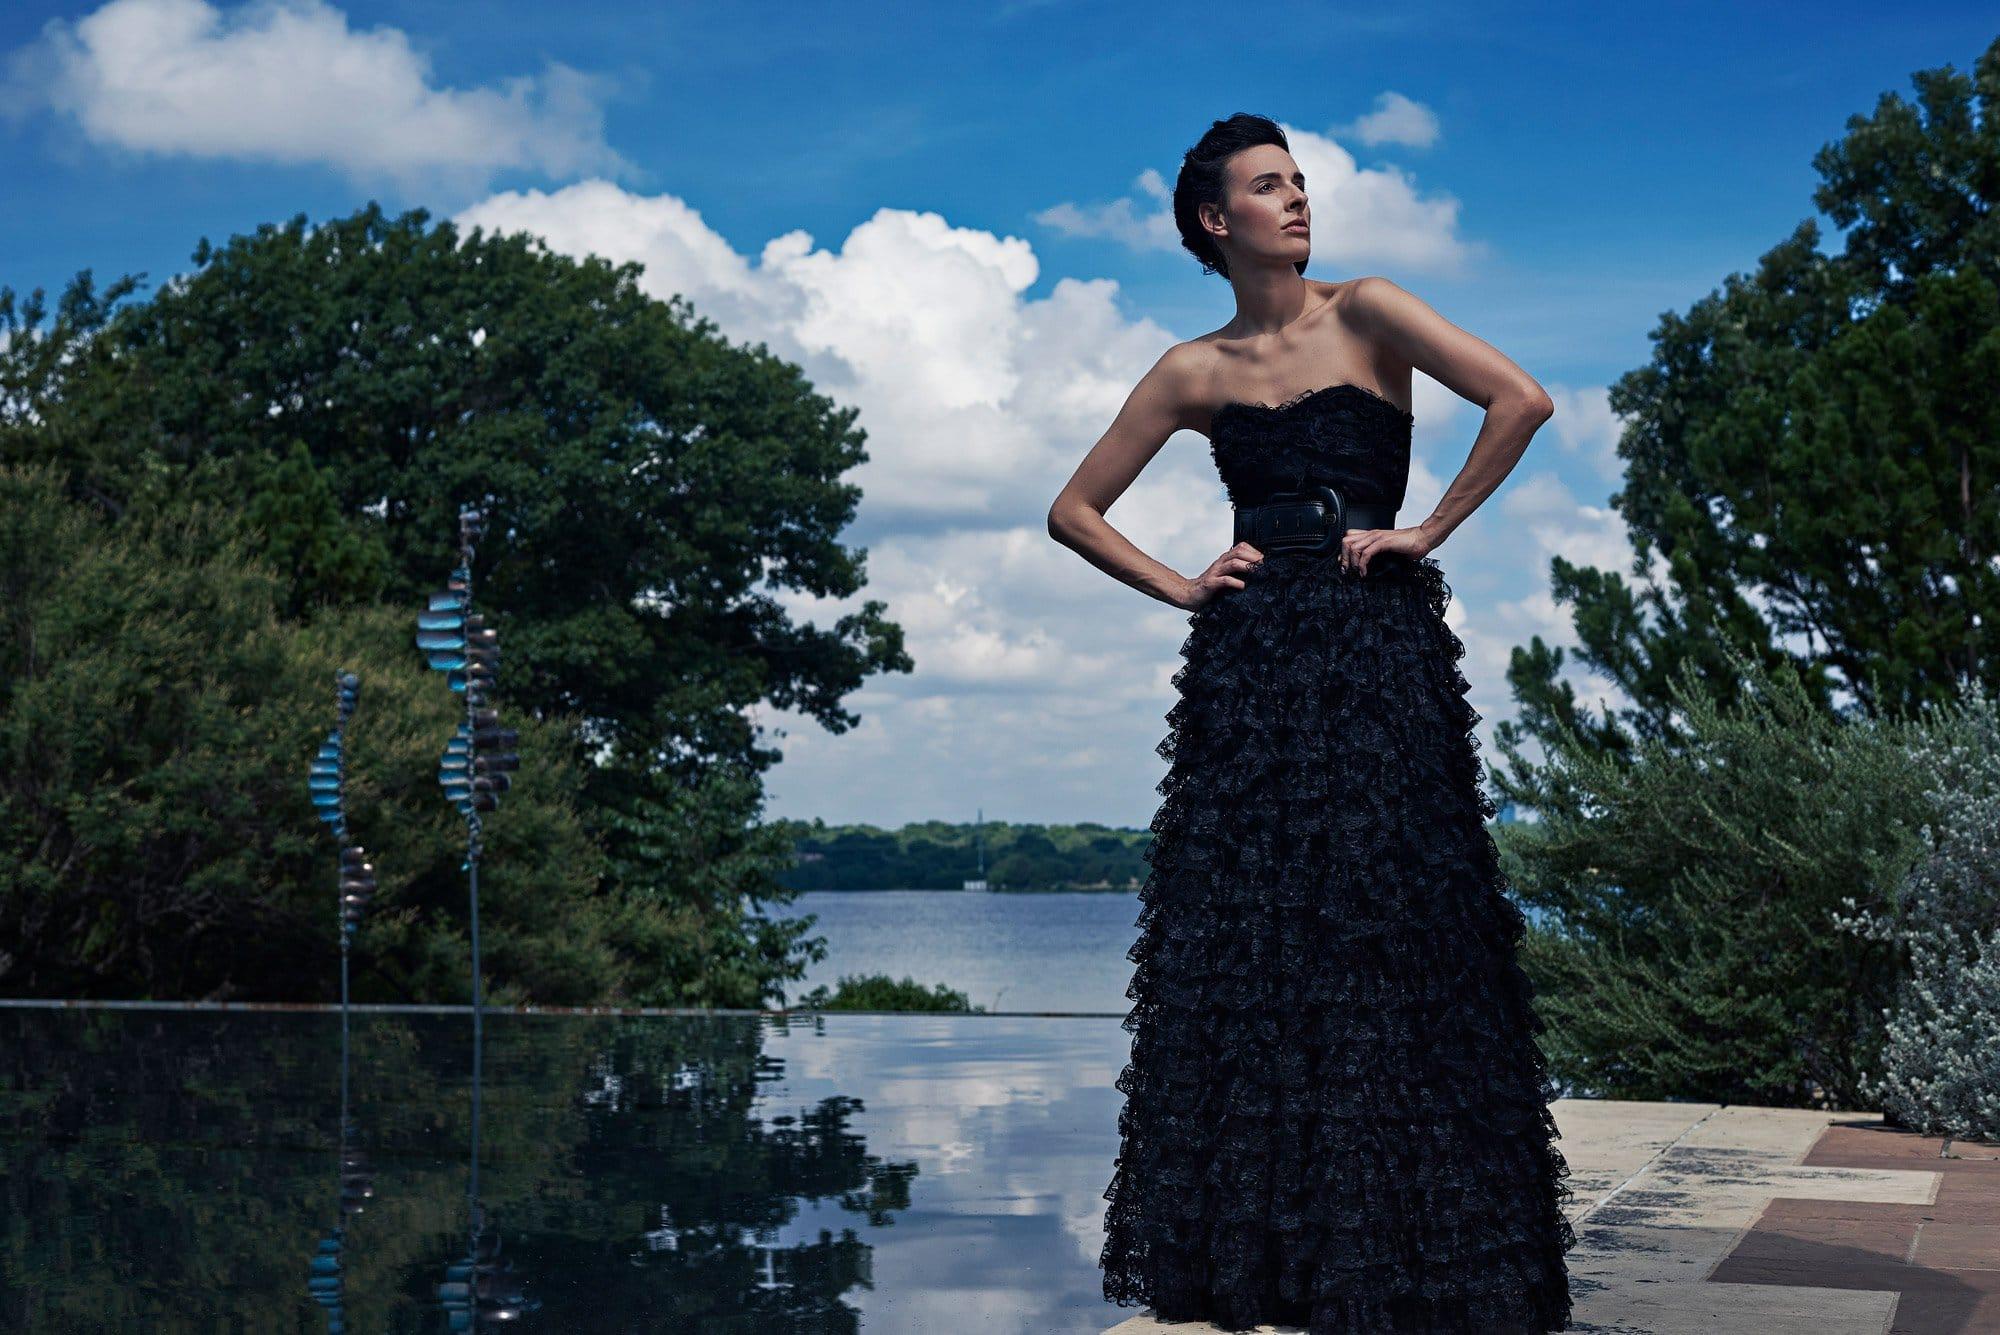 dallas-fashion-model-photoshoot-arboretum-014